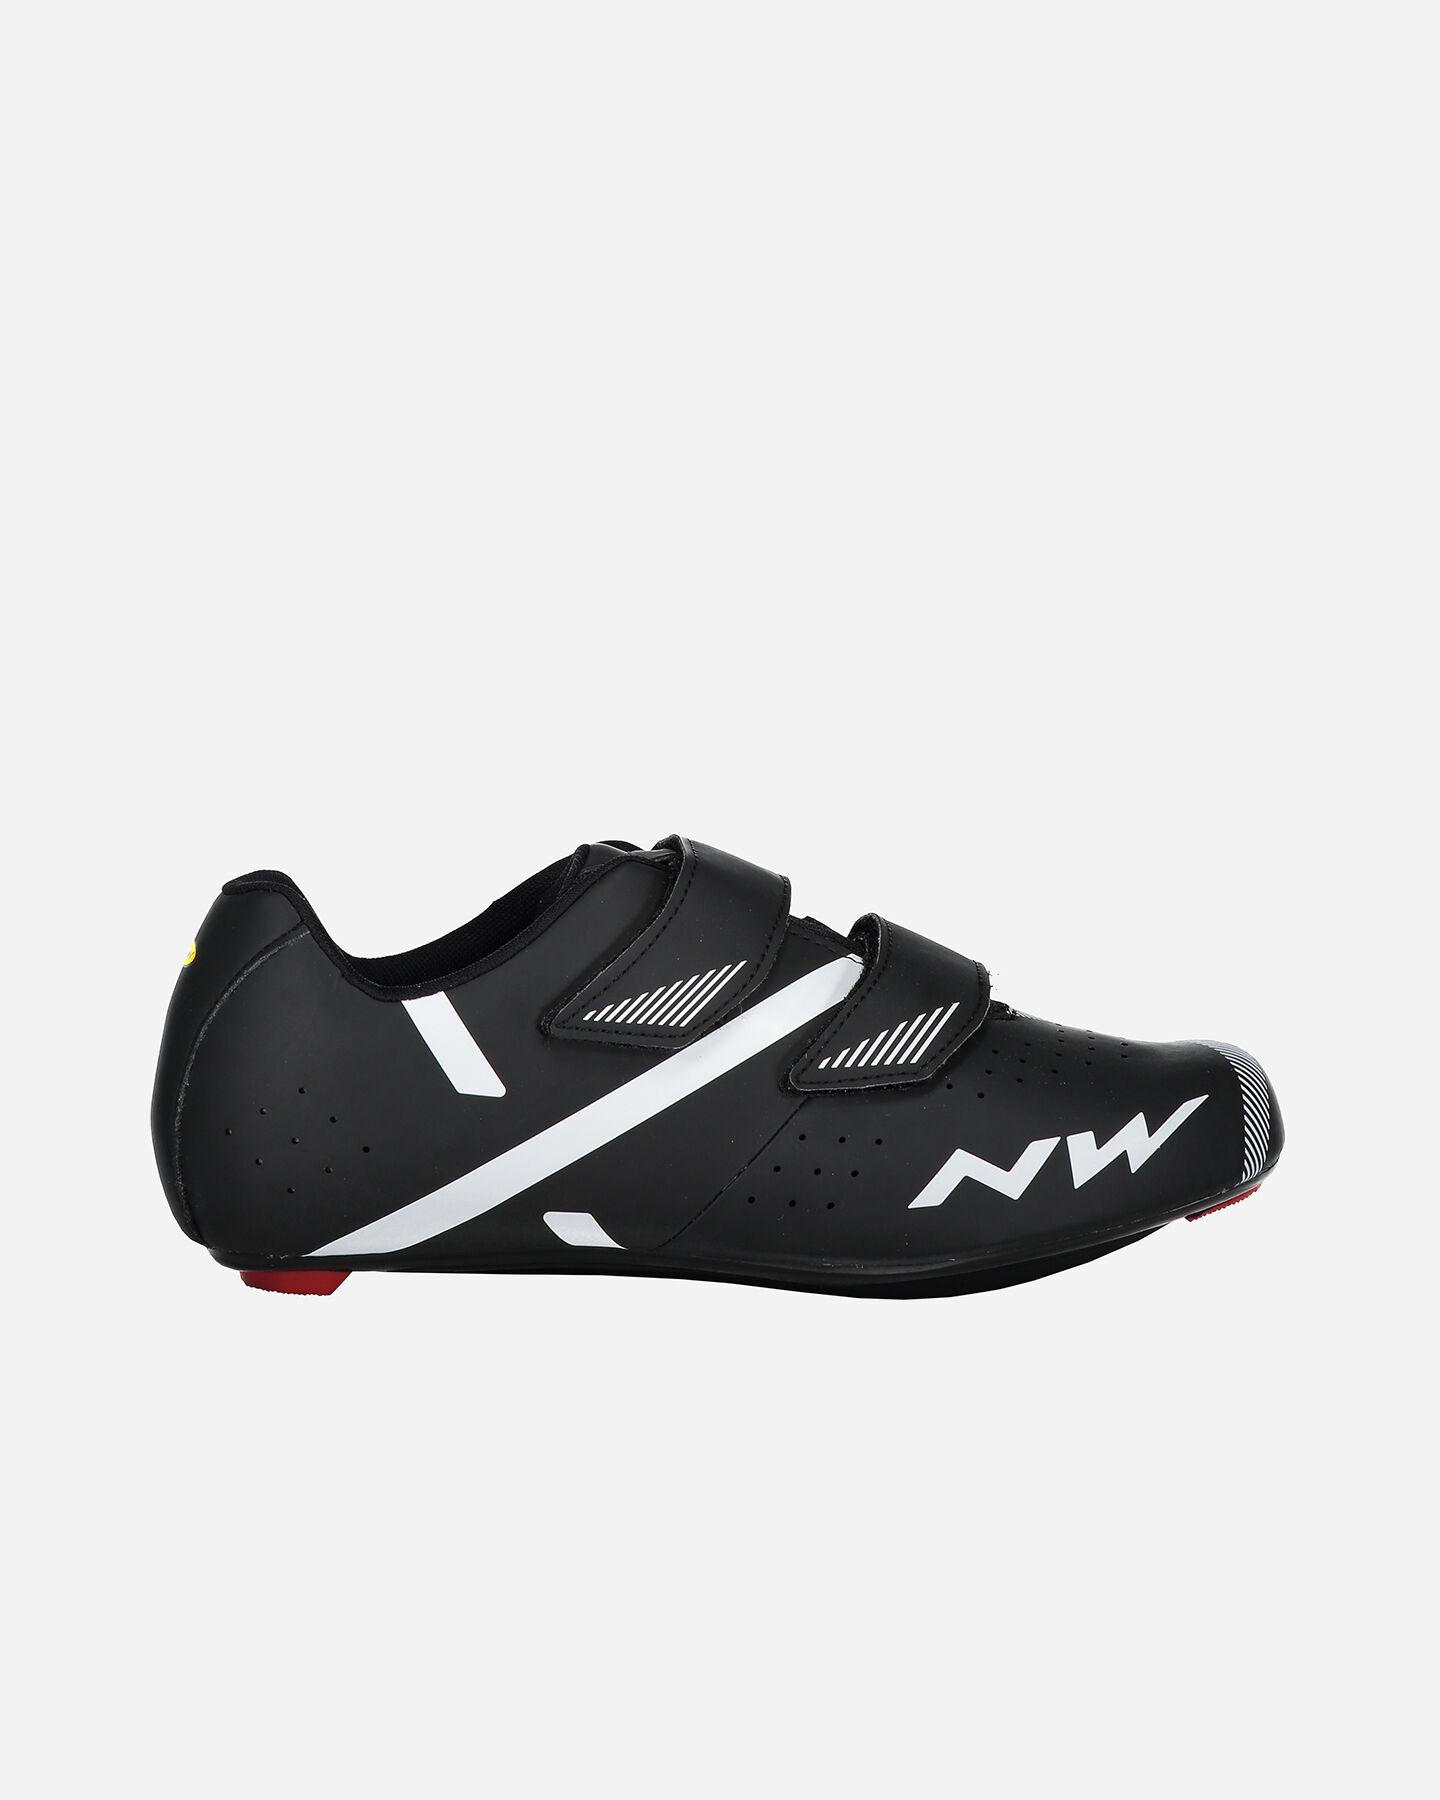 Scarpe E Nere 270 Nike Rosse Air Max MGqSzVUp